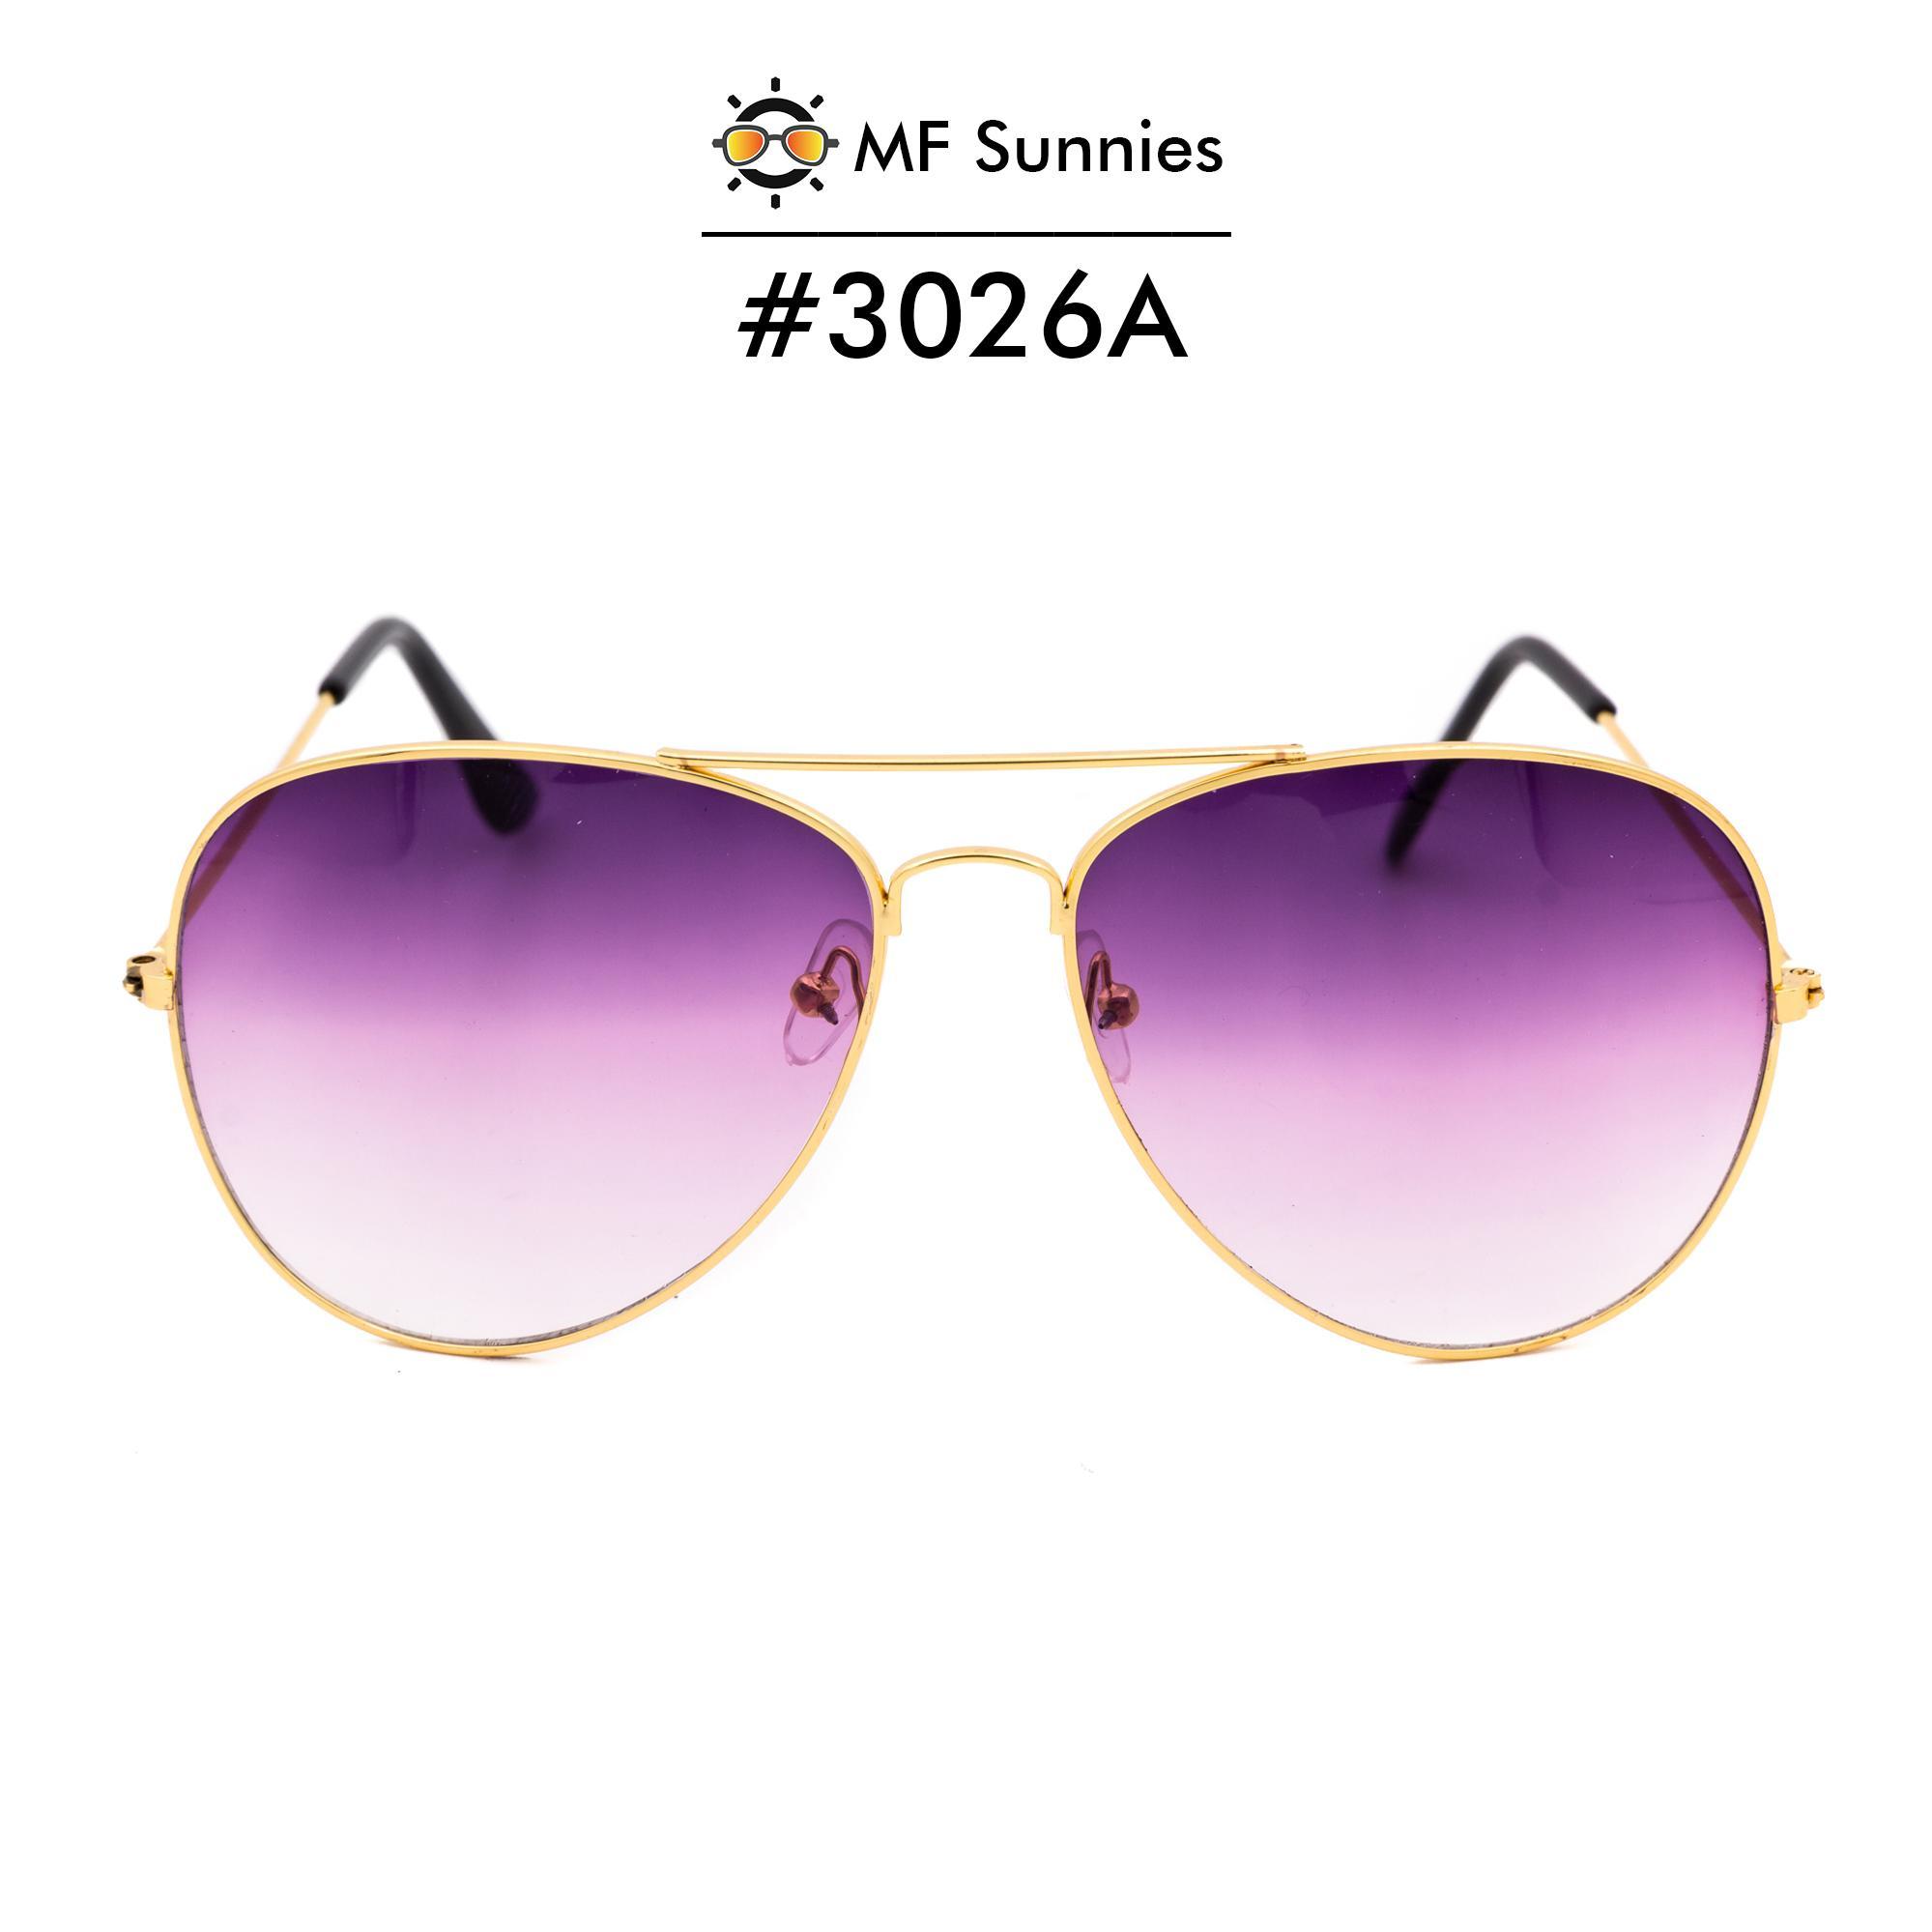 b3bd171a4b MFSunnies Sunnies Classic Aviator Gradient lens Metal Frame Fashion eyewear  Gradient Purple  3026A